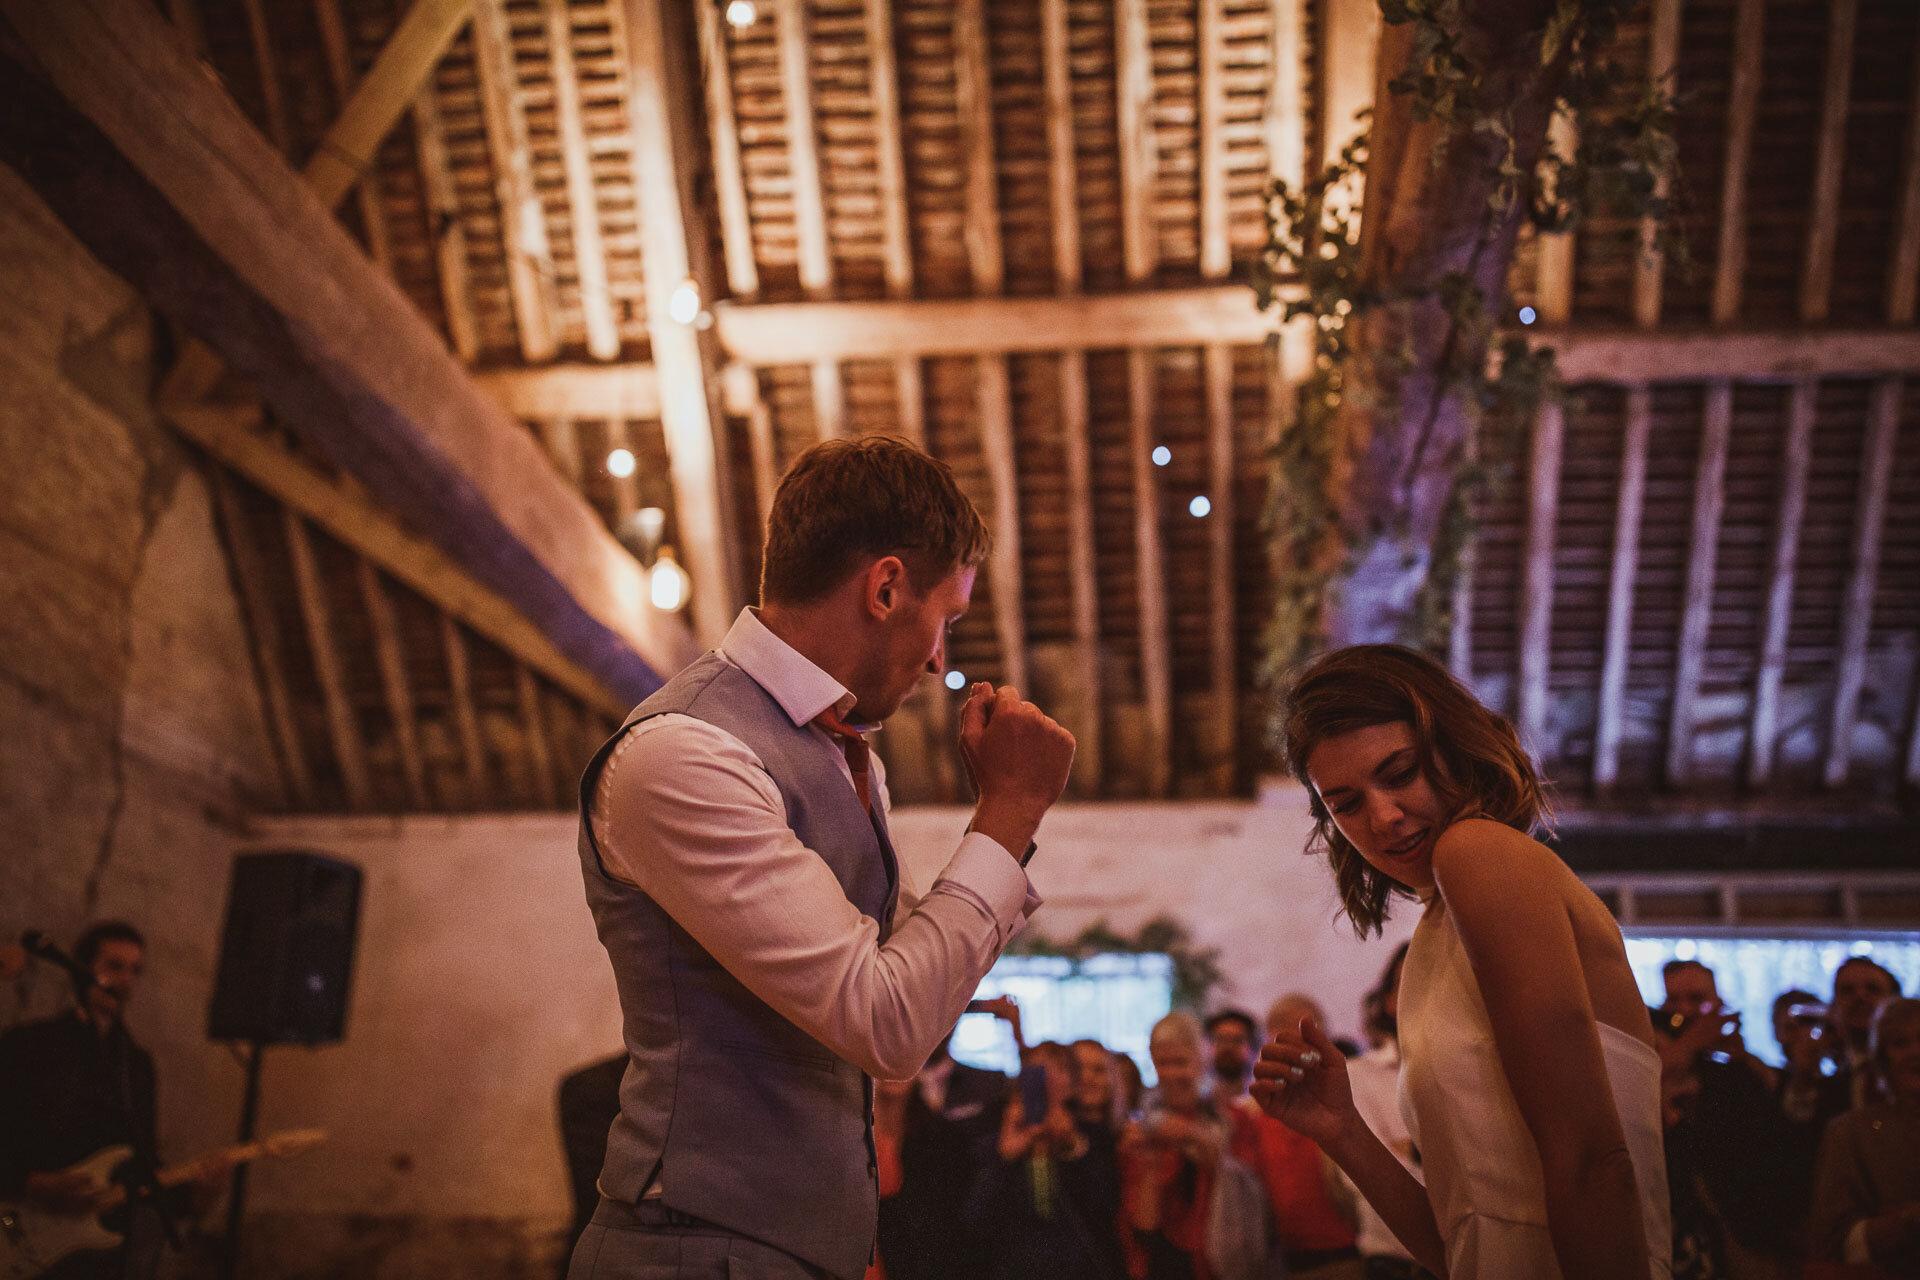 dorset_wedding_photographer-140.jpg